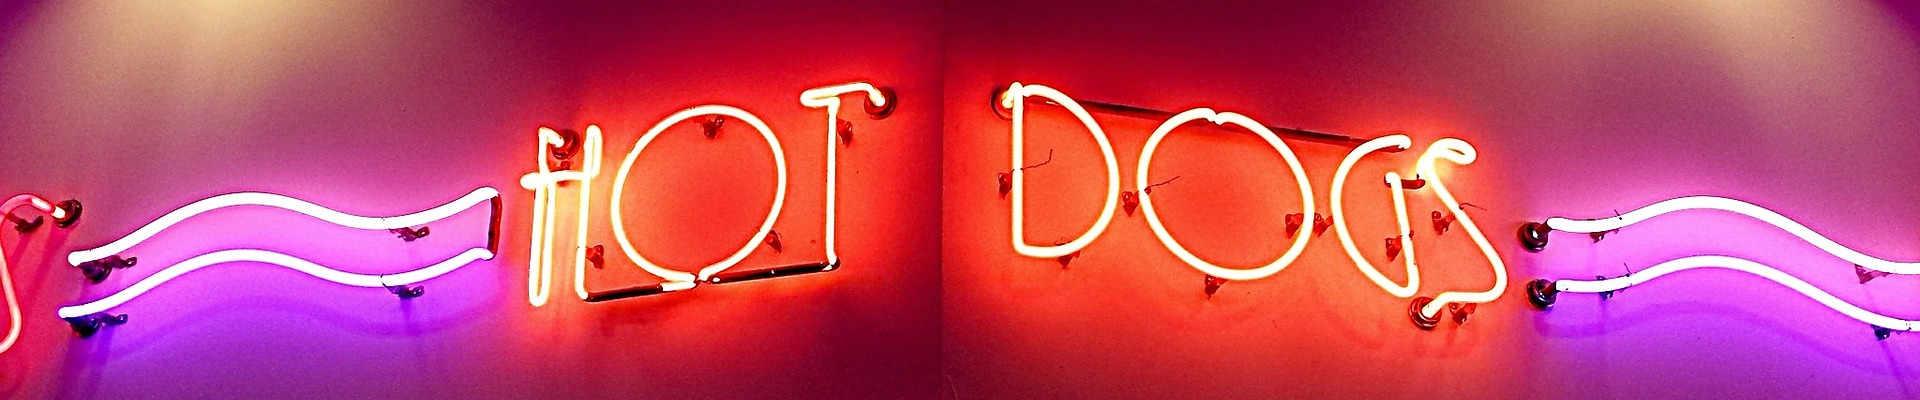 Hot_Dog_Banner.jpg